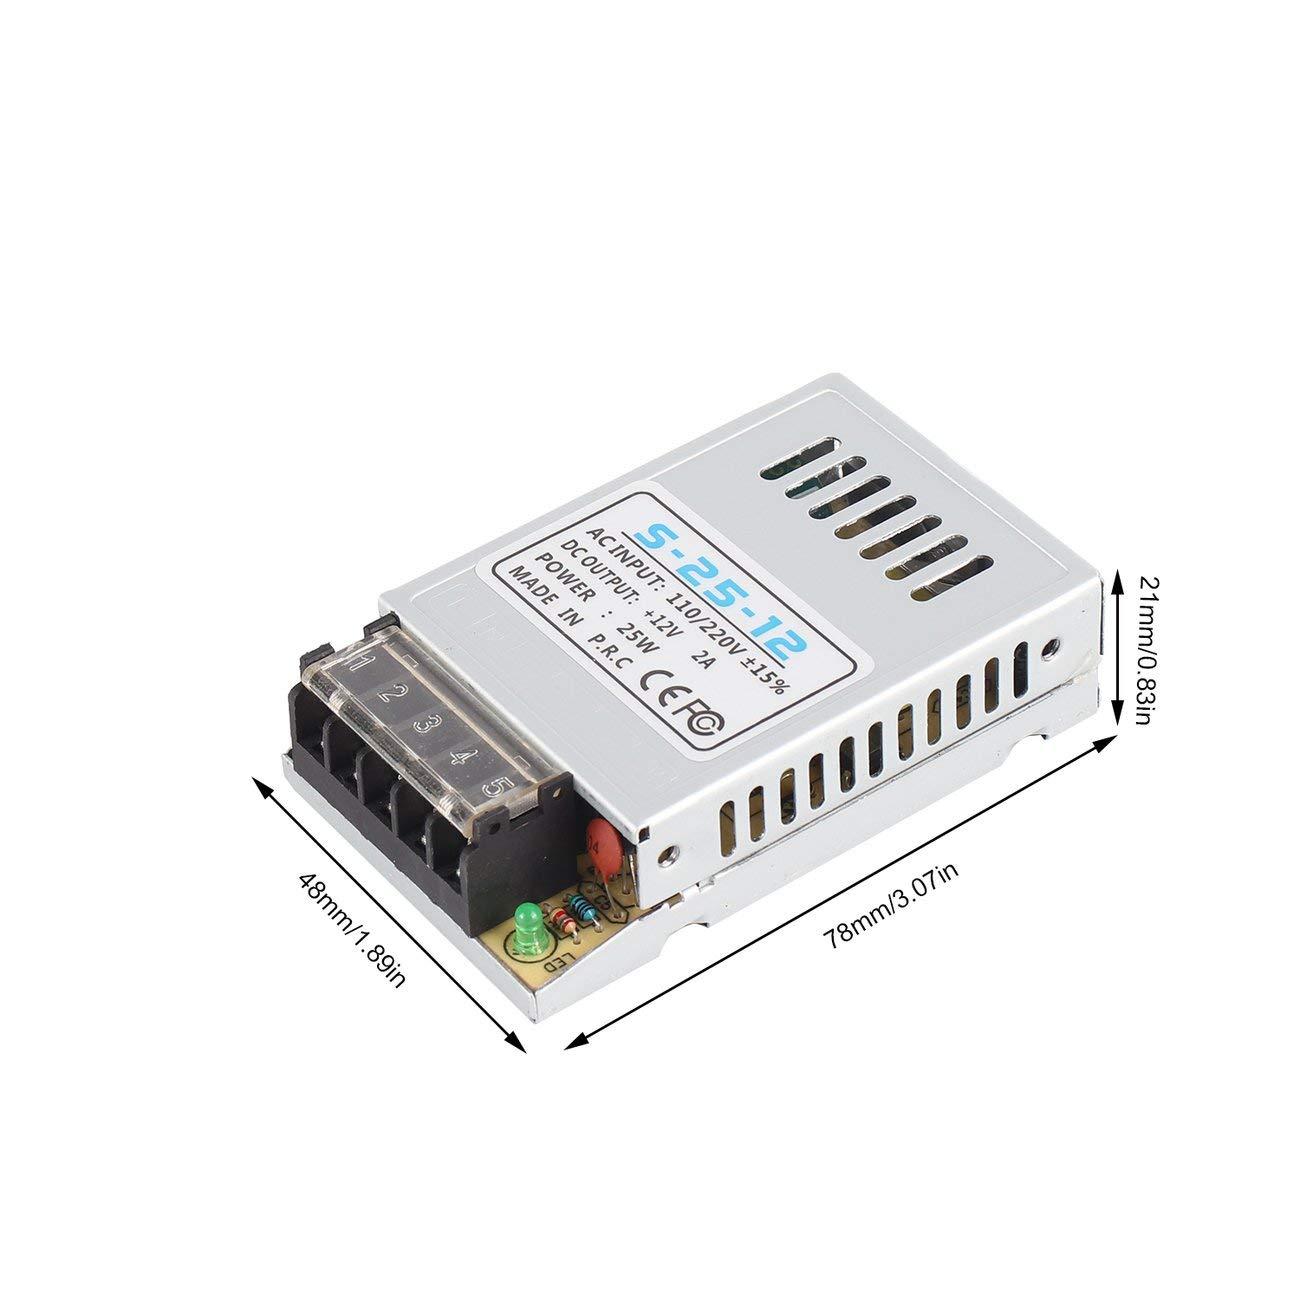 JBP-X Alimentatore di commutazione universale da CA a CC 12V 2A 24W Ingresso driver luce LED ultrasottile portatile 110 V 220 V S-24-12